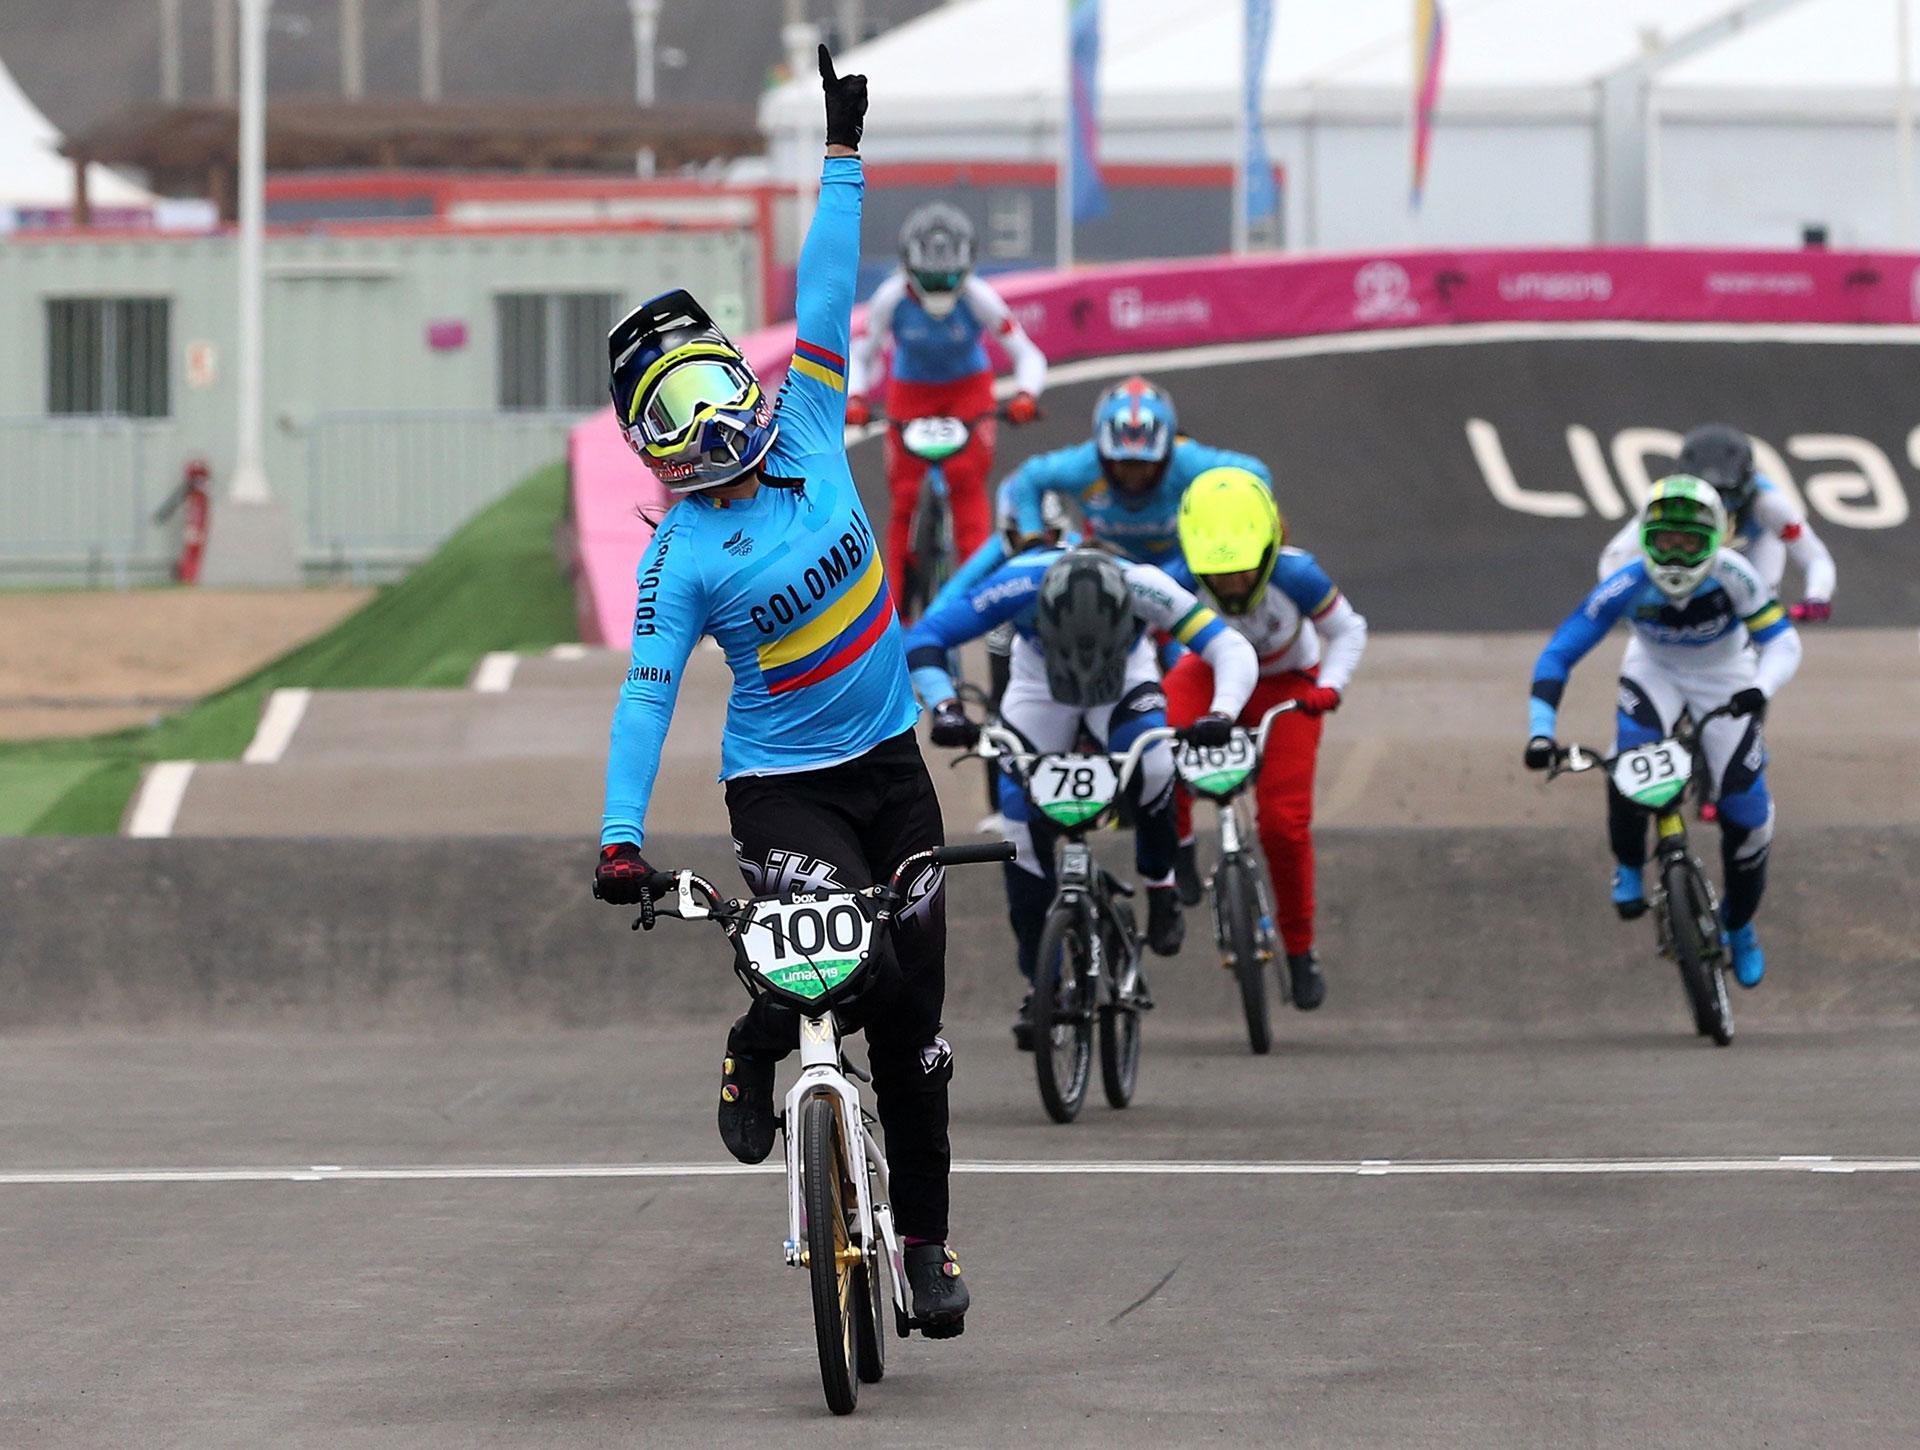 XVIII Pan American Games - Lima 2019 - Cycling BMX - Women's Final  - Costa Verde Beach Circuit, Lima, Peru - August 9, 2019. Colombia's Mariana Pajon wins the race. REUTERS/Pilar Olivares